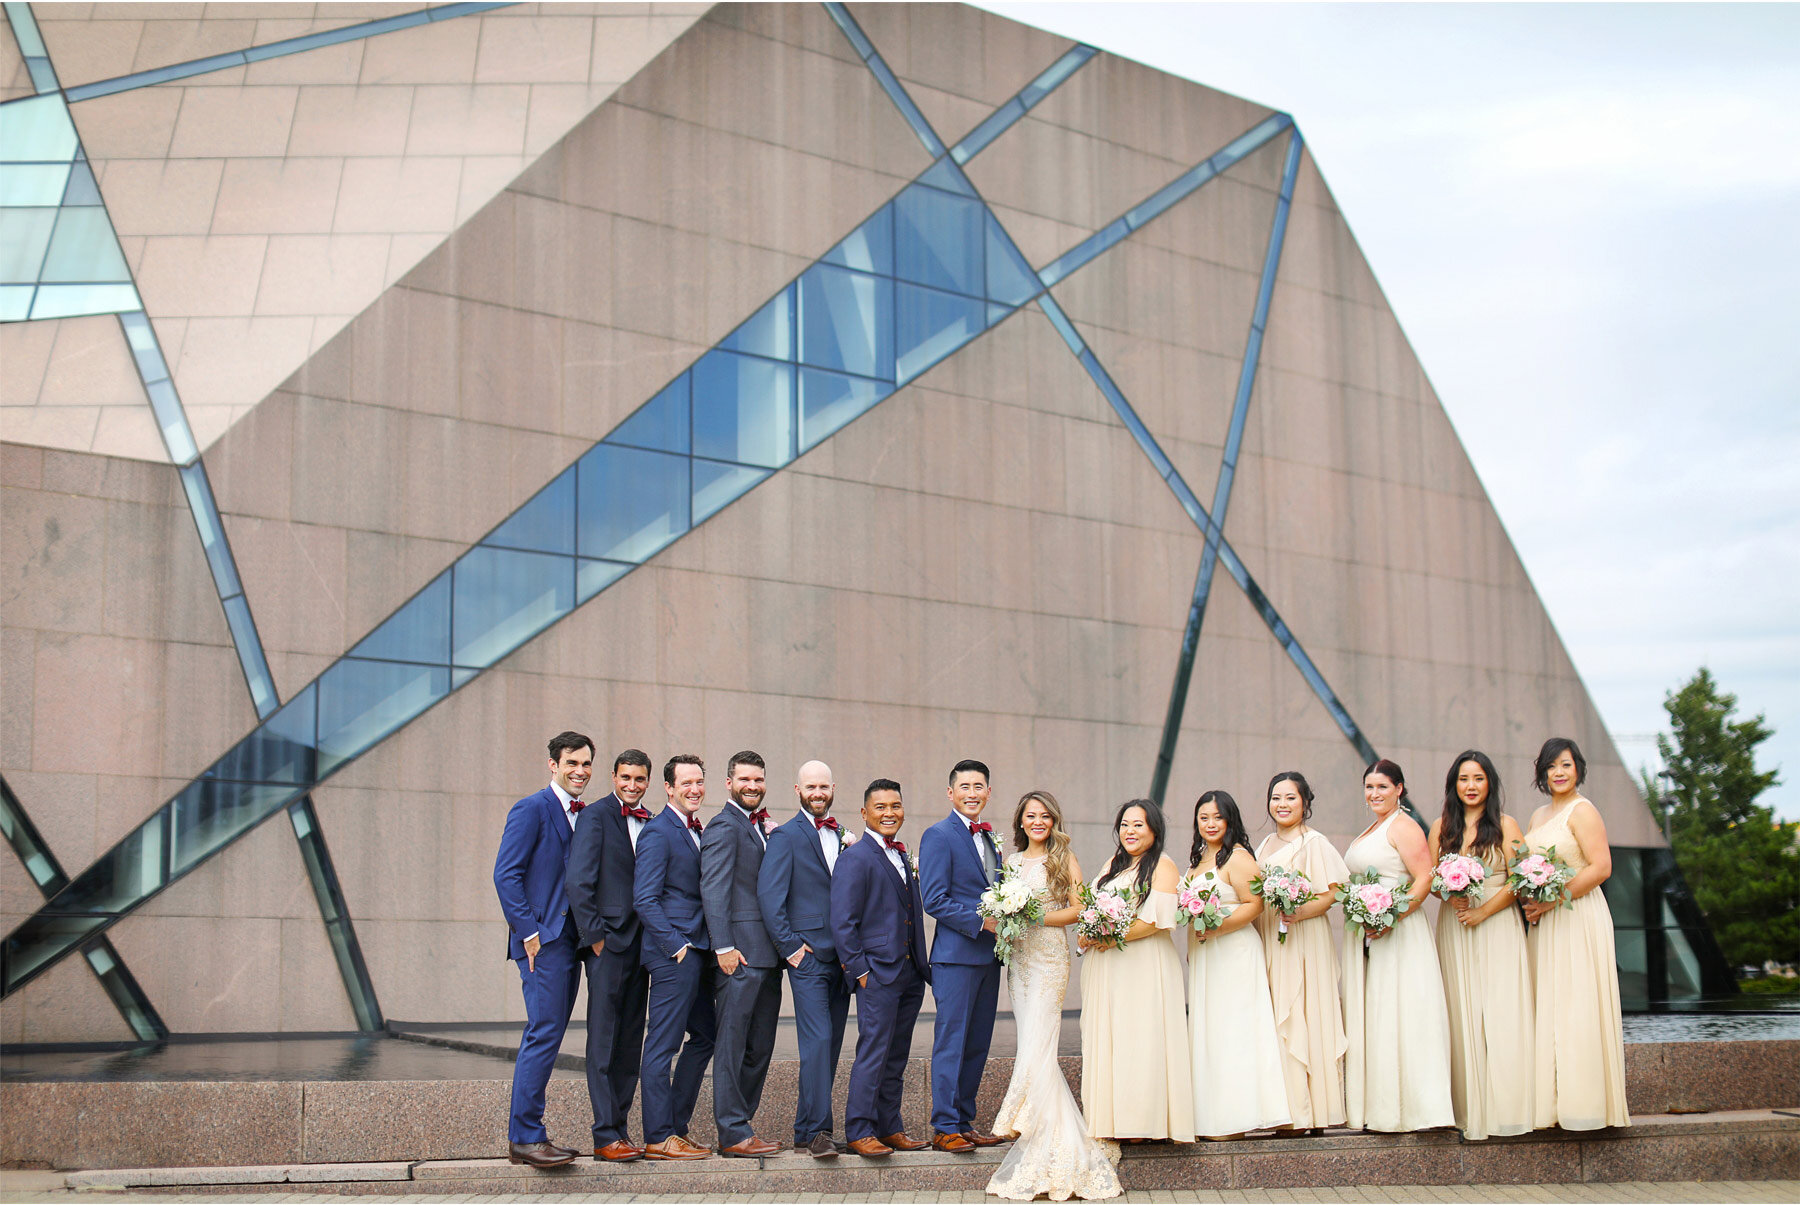 09-Vick-Photography-Minneapolis-Minnesota-U-of-M-Alumni-Center-Bride-Bridesmaids-Groom-Groomsmen-Mai-&-Ross.jpg